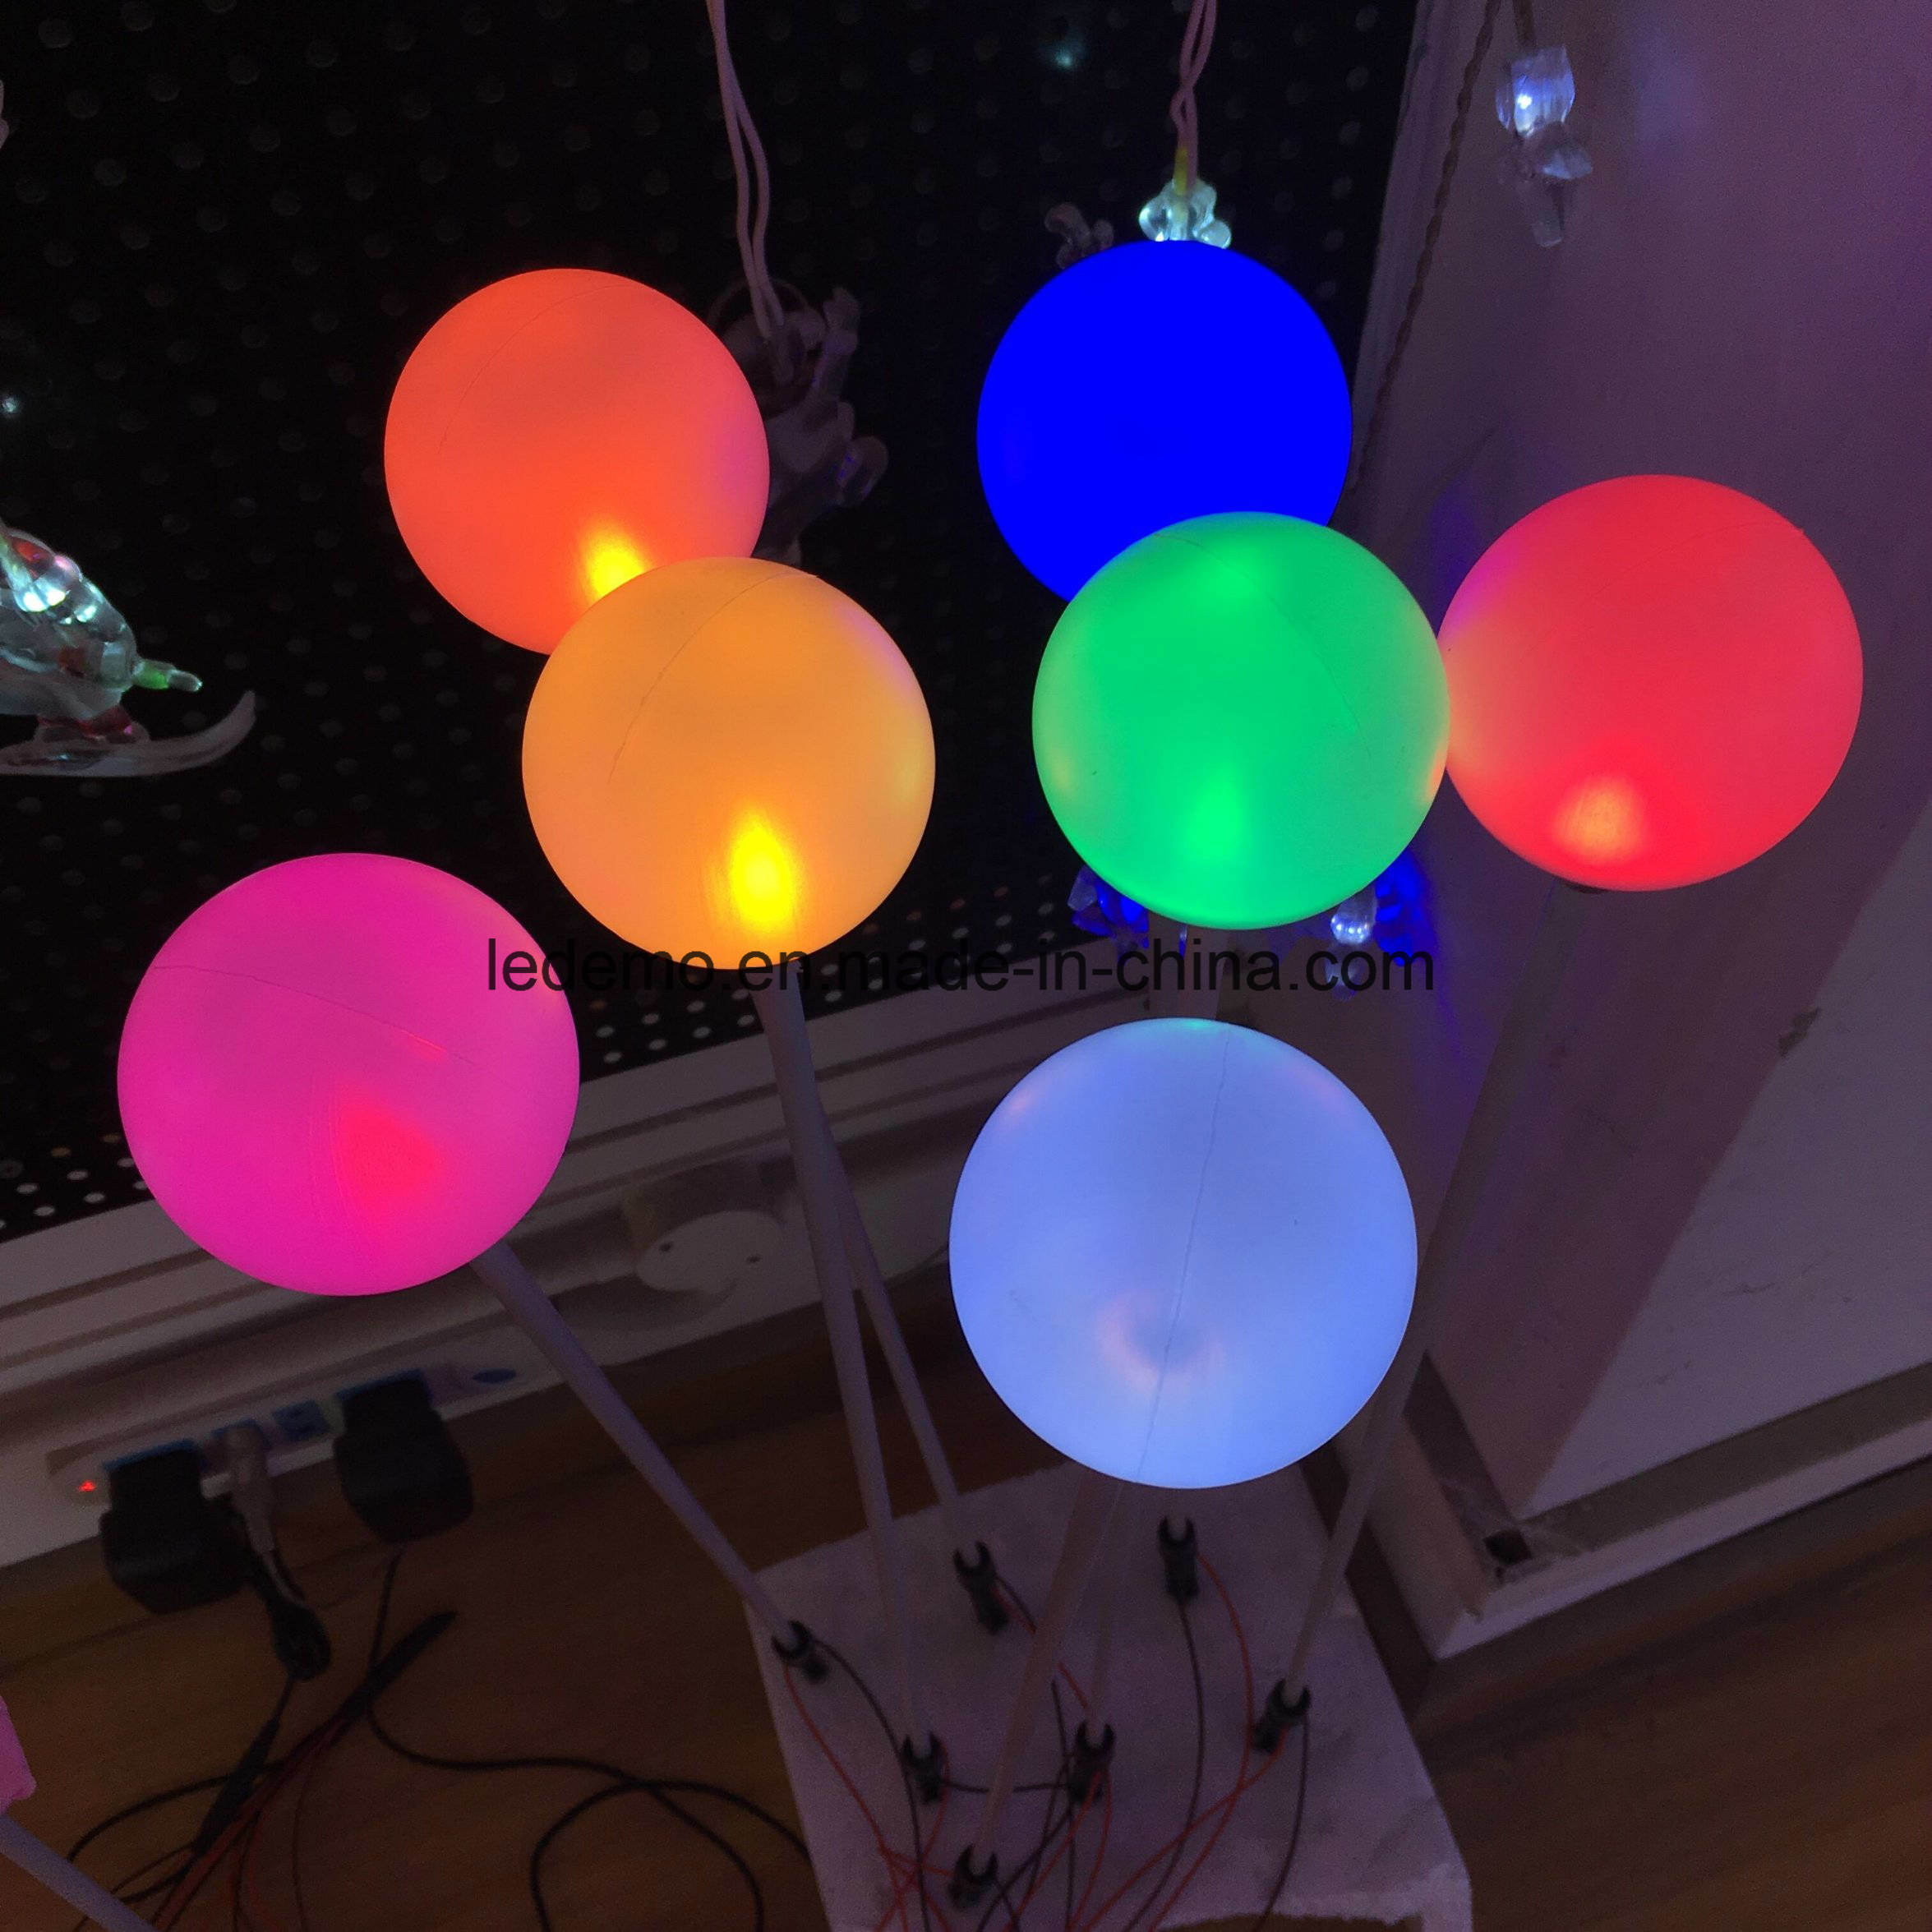 LED Colorful Landscape Lamp Night Light for Decoration